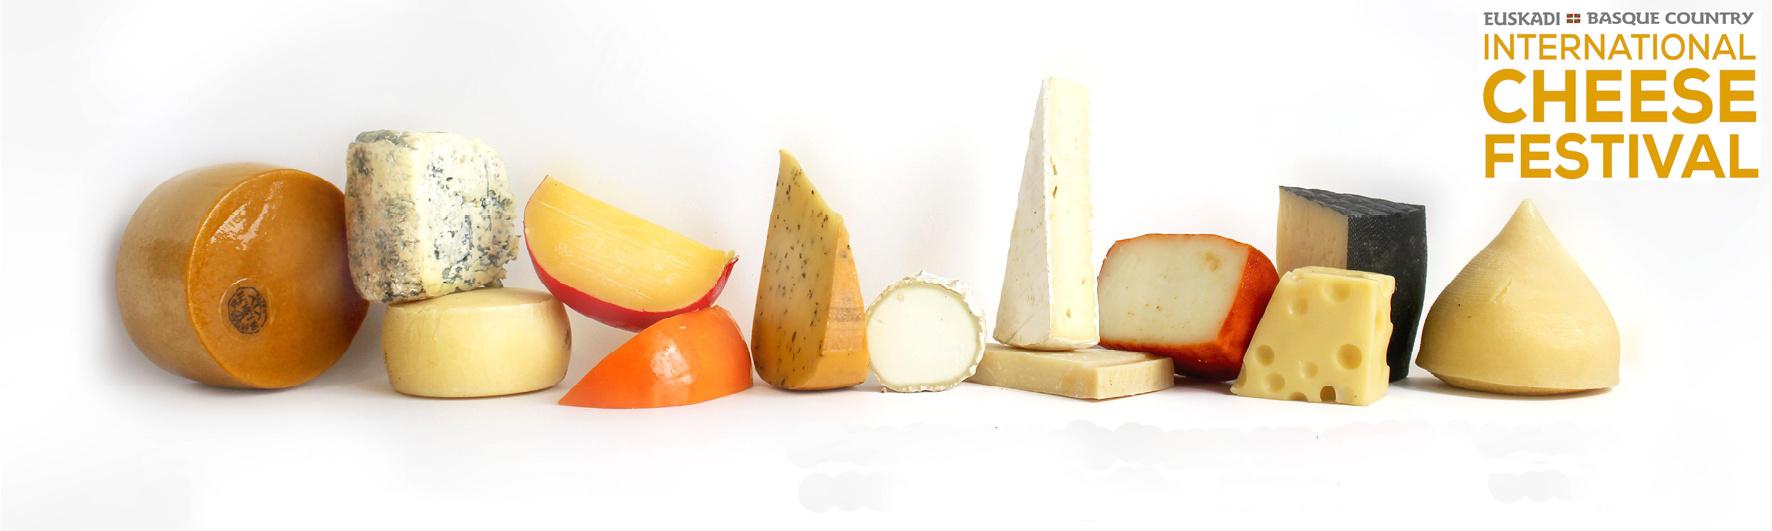 San Sebastián, capital mundial del queso